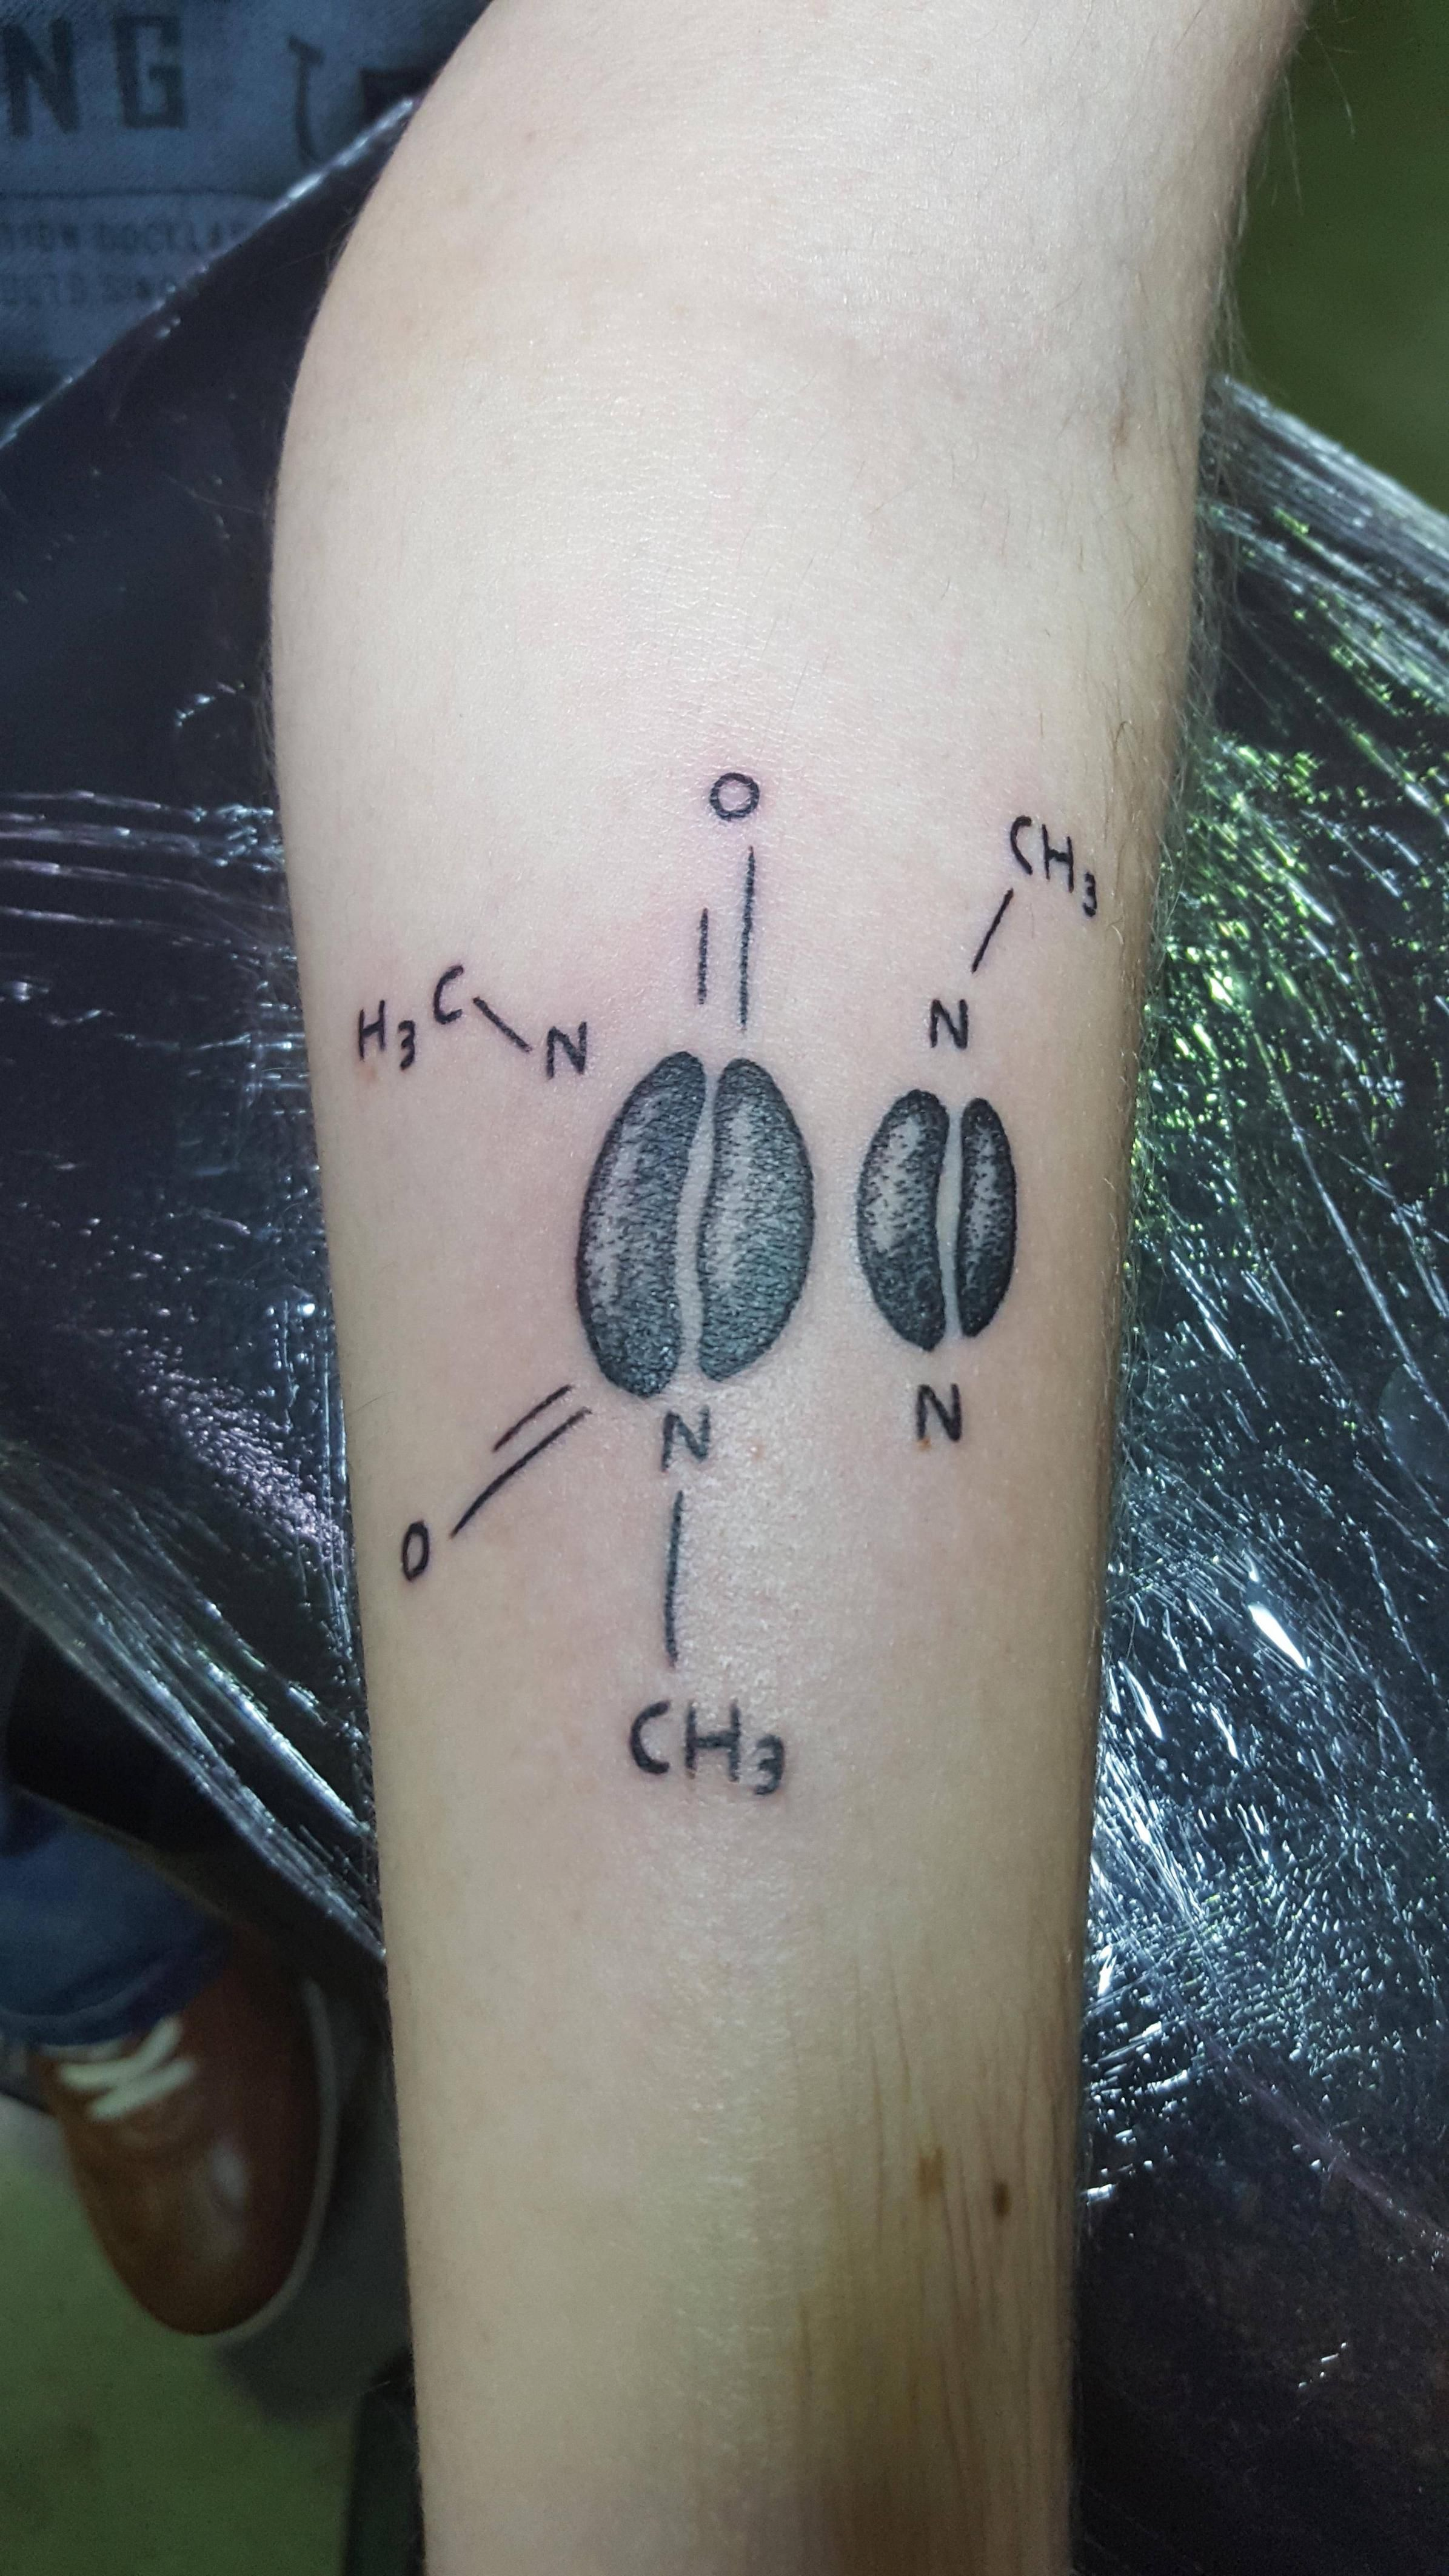 Caffeine molecule by pol noir charbon mons belgium done for Caffeine molecule tattoo